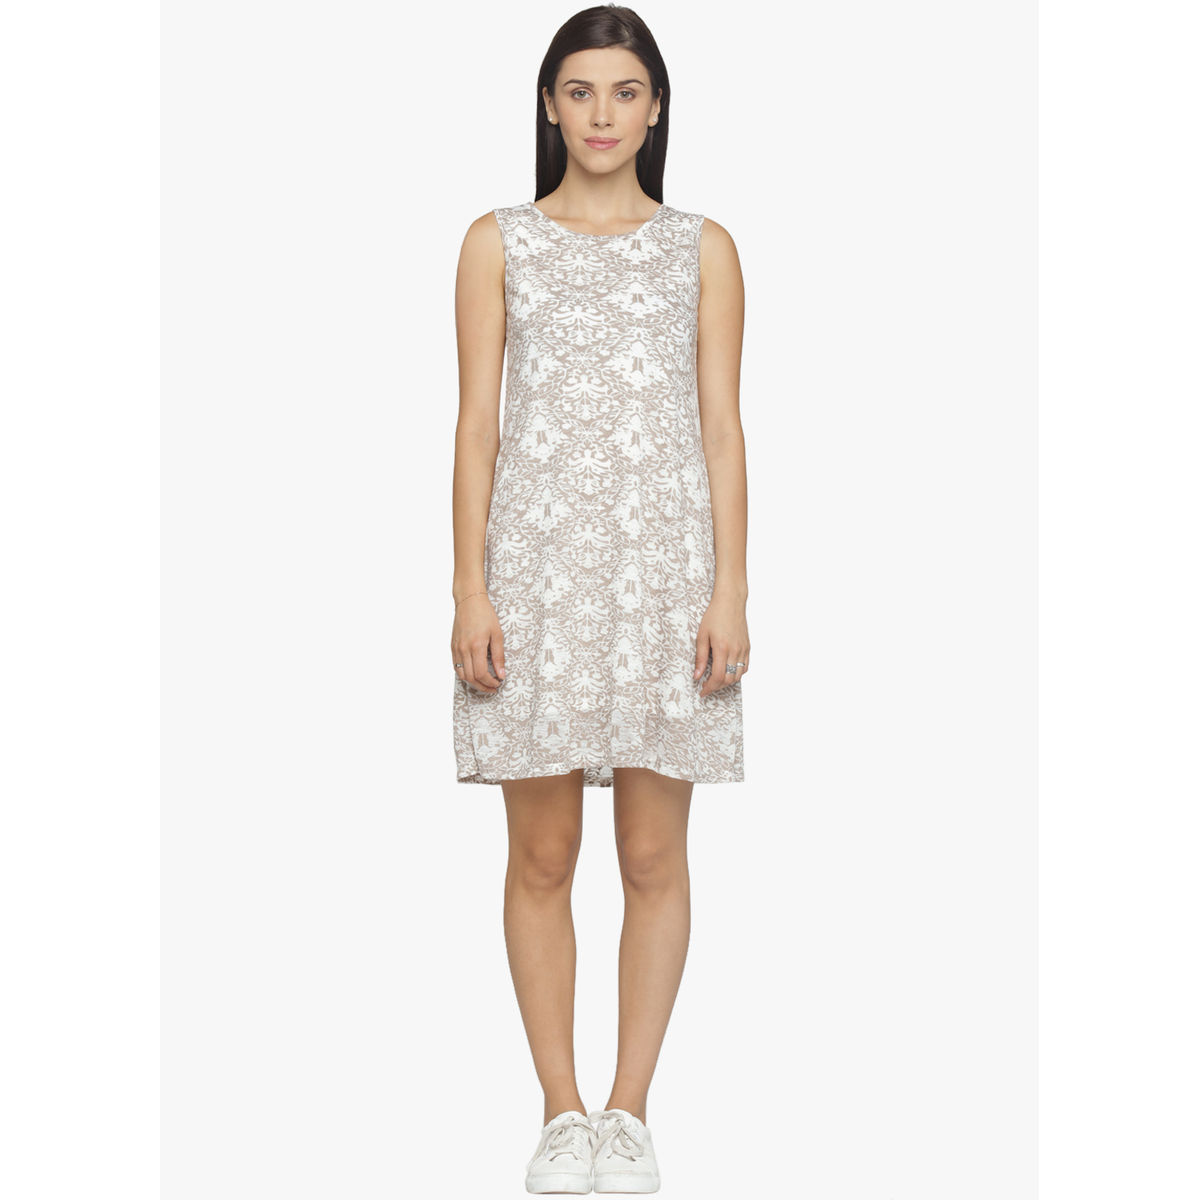 PAOLA BRASSO SHIRT DRESS